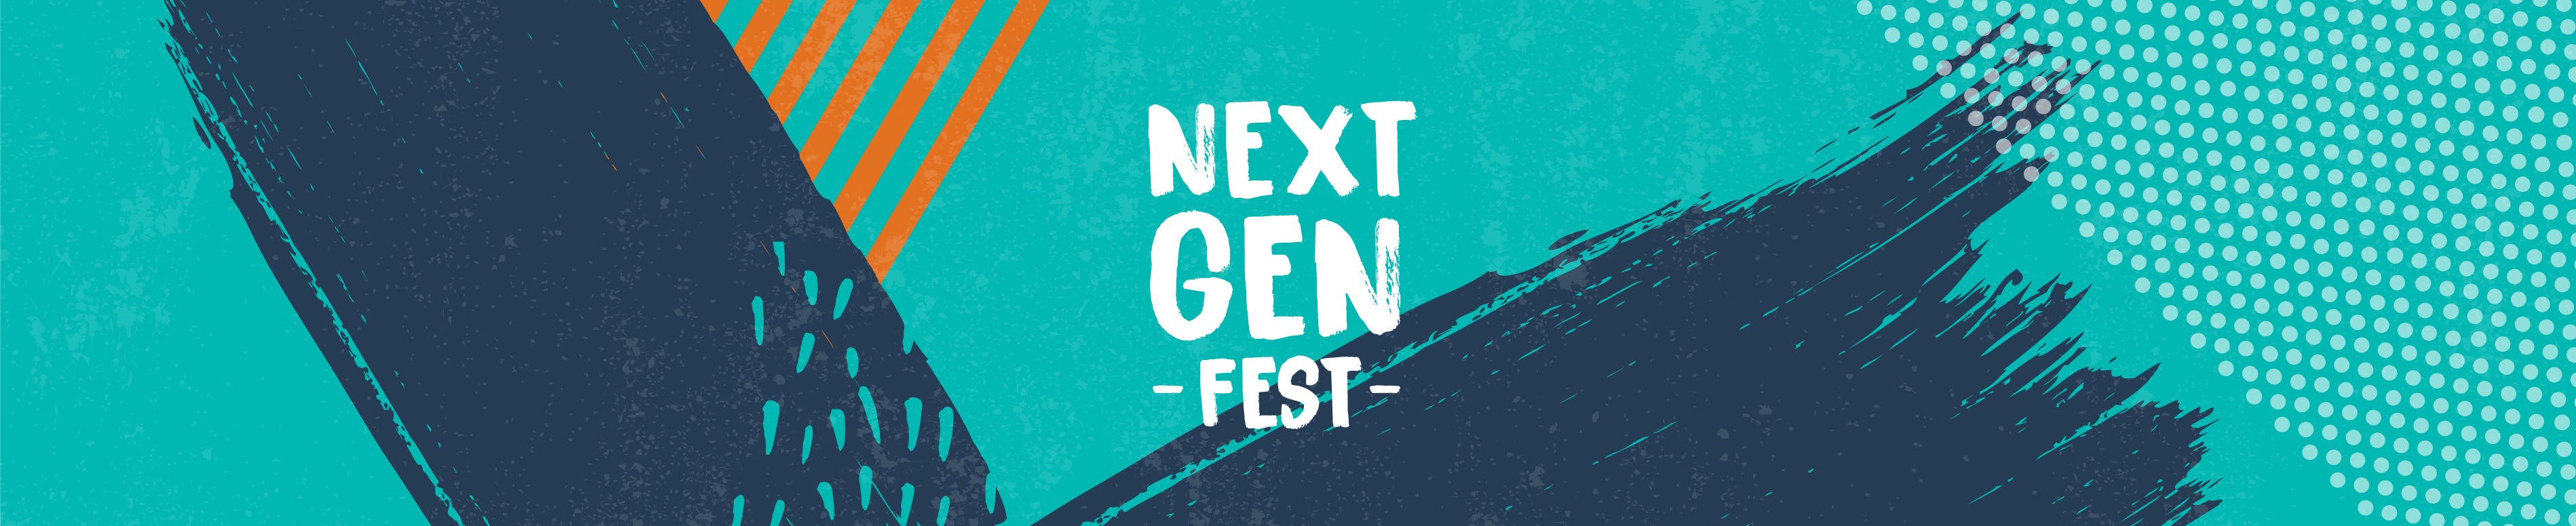 Next Gen Fest London: Inspirational festival for young entrepreneurs